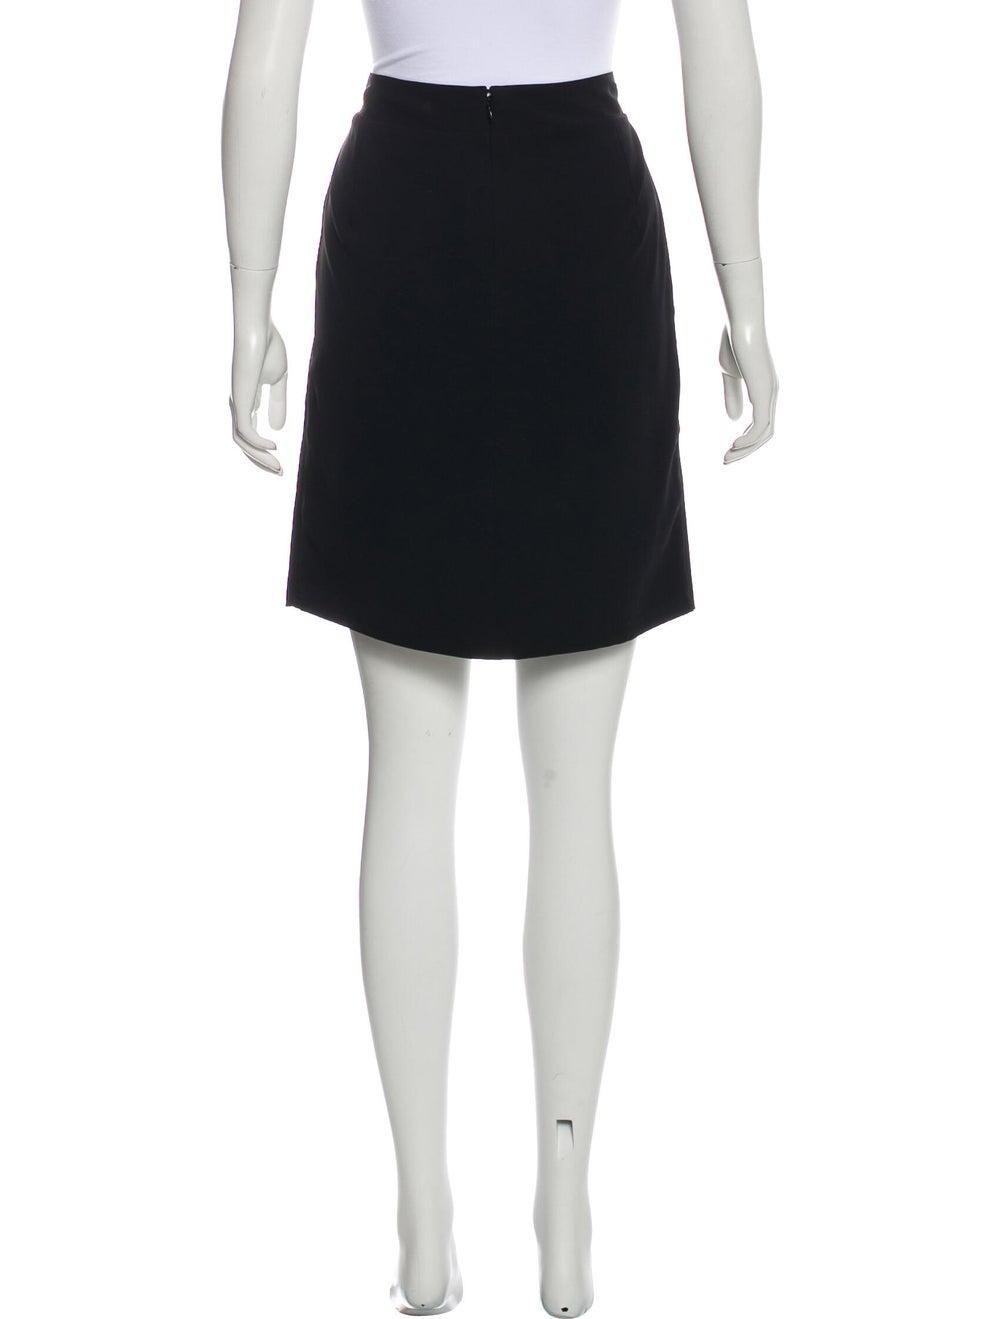 Chanel Paris-Shanghai Tiered Skirt Black - image 3